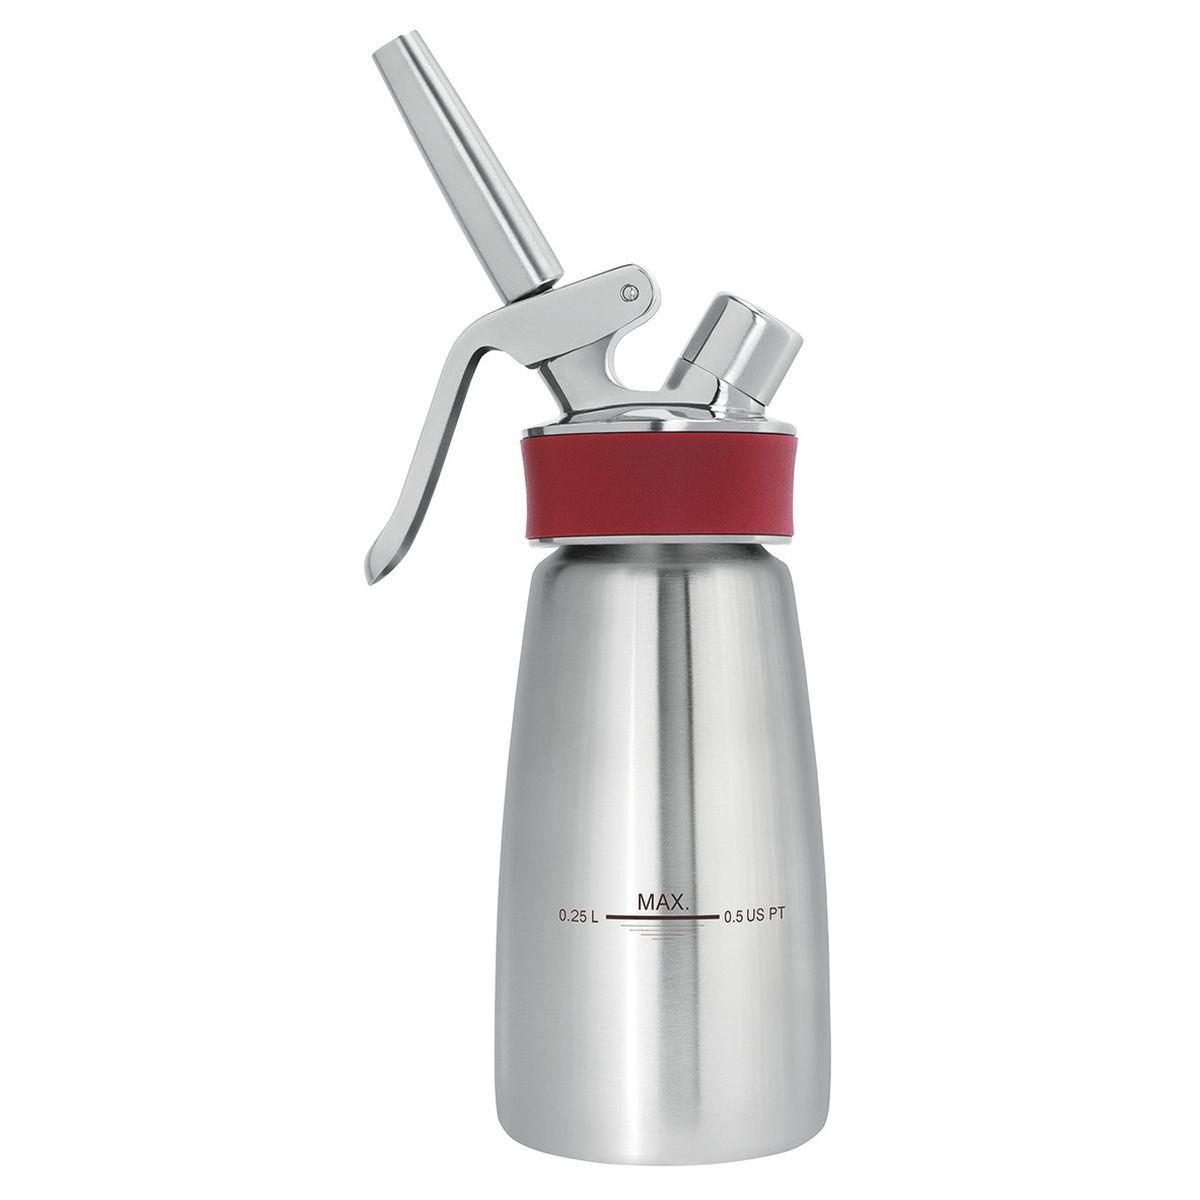 Siphon Gourmet Whip Plus professionnel en inox 0.25 L - Isi